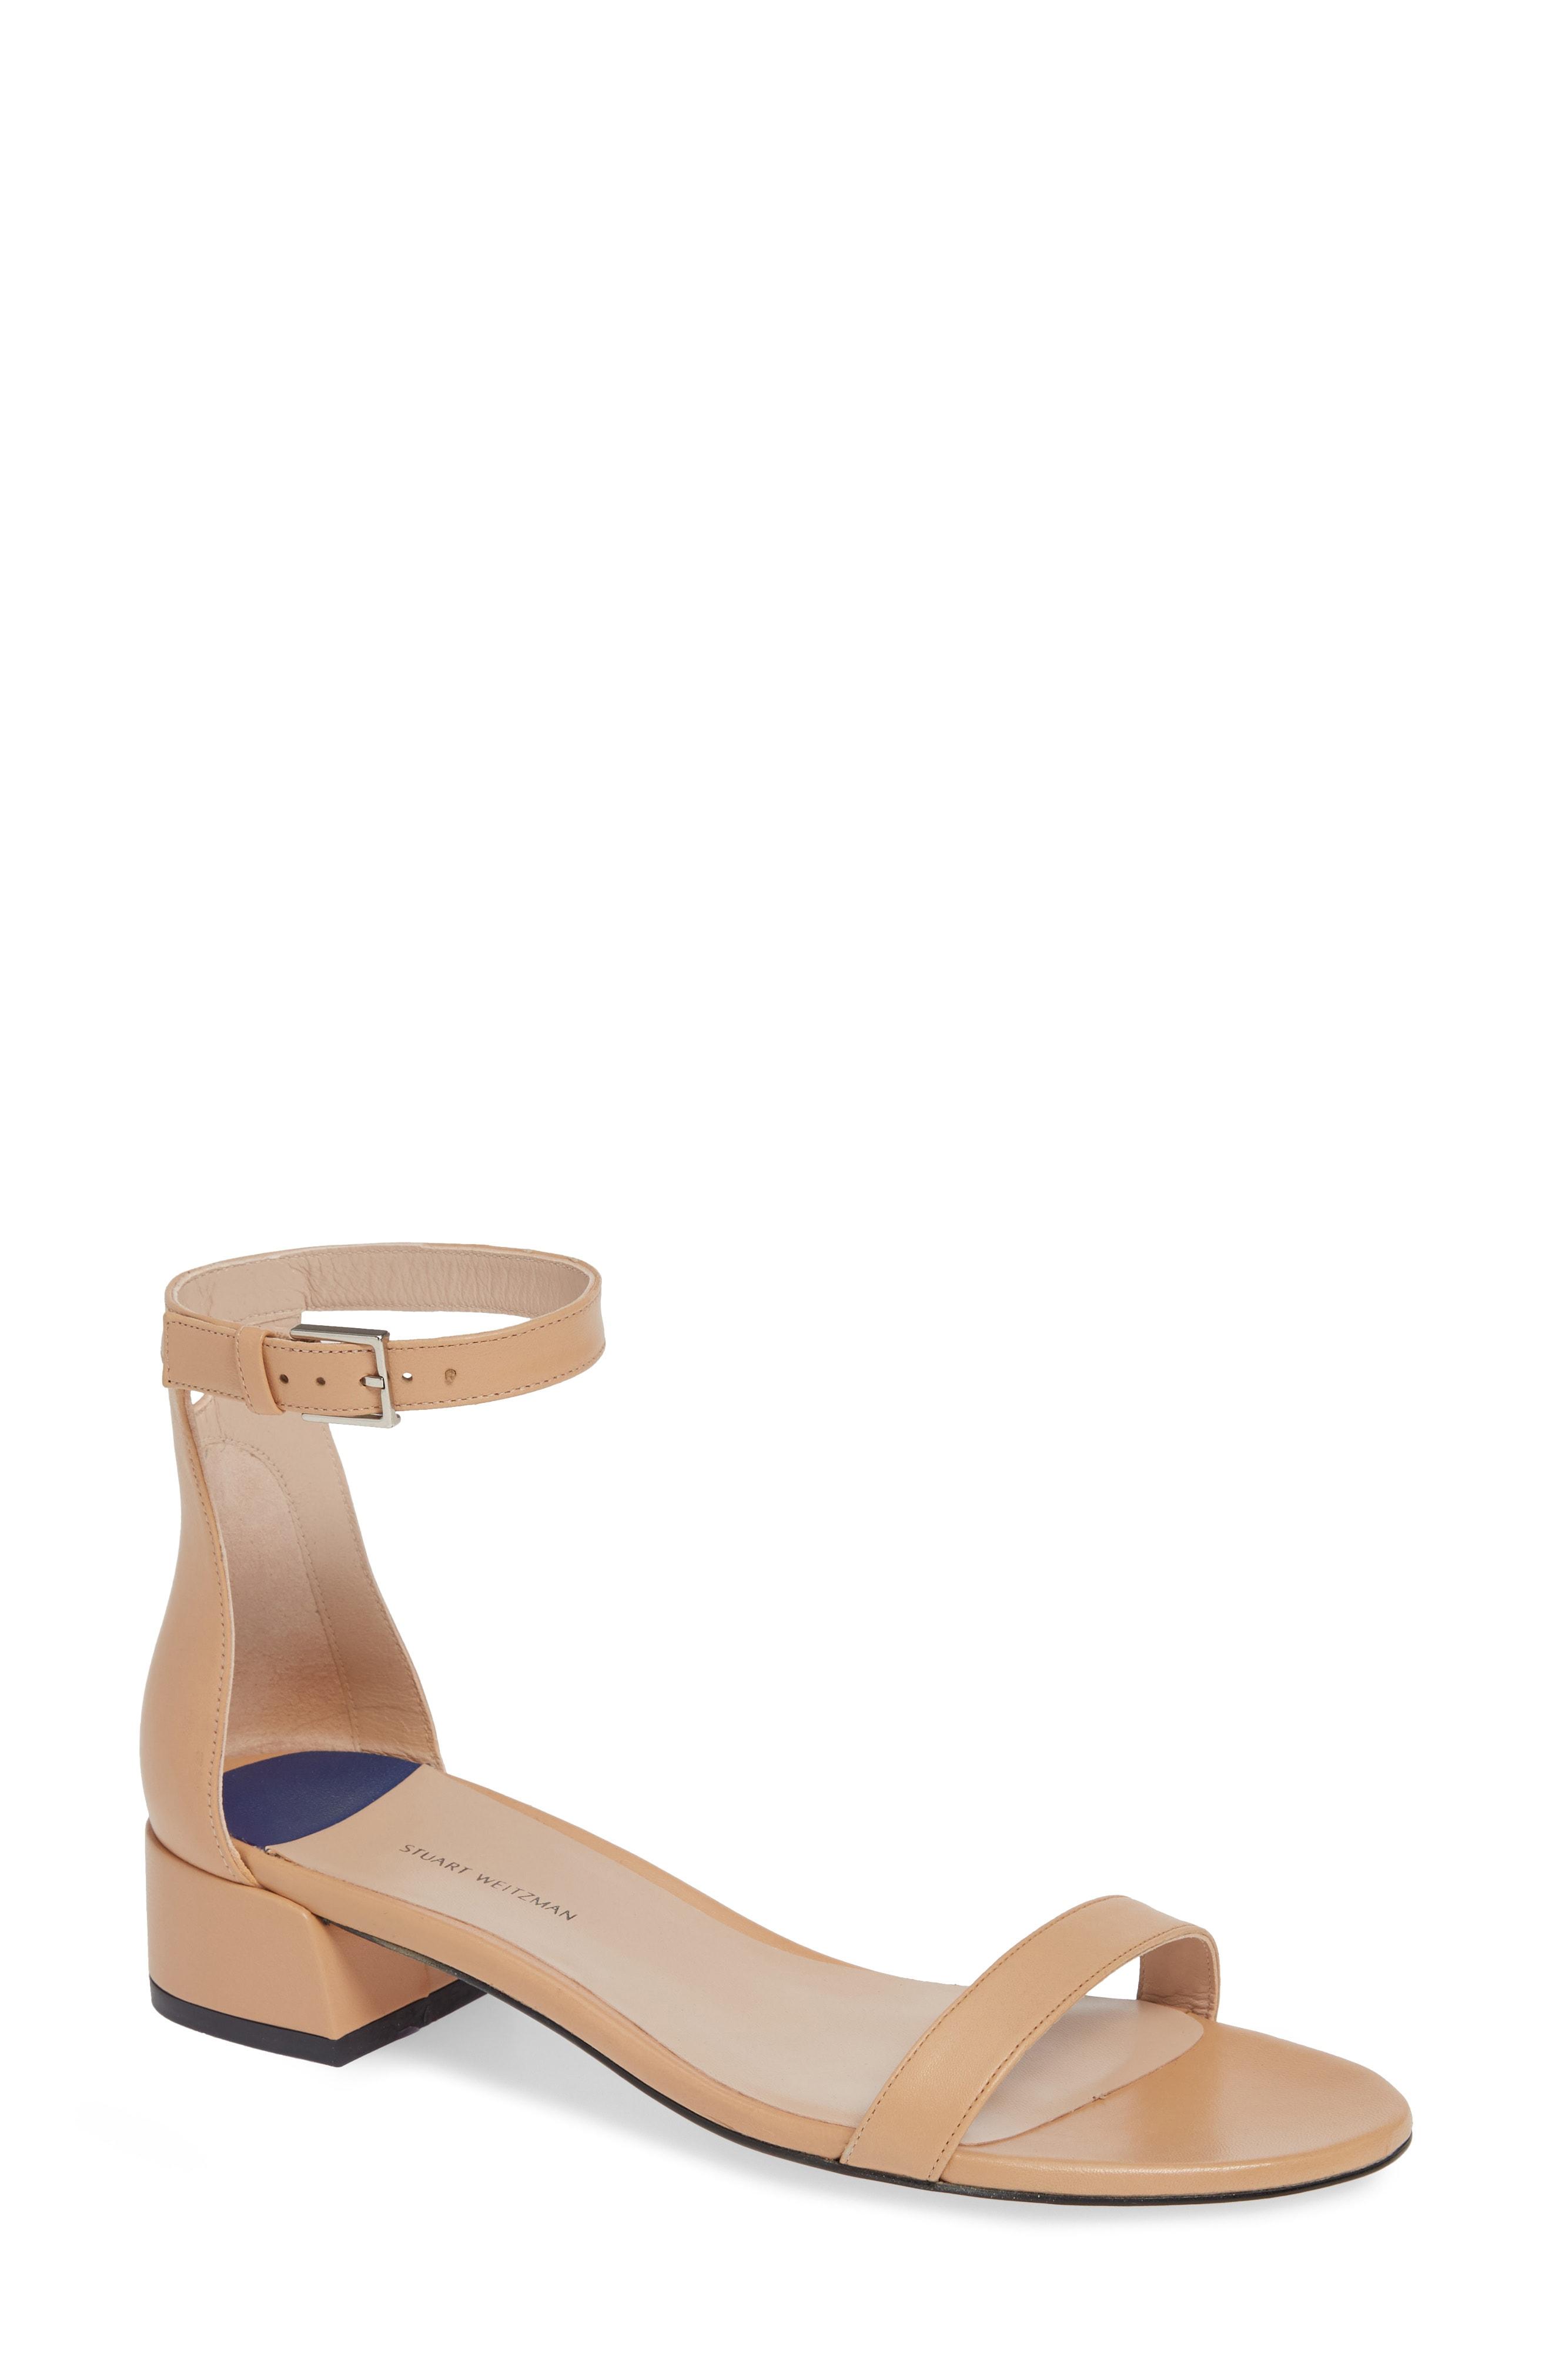 Stuart Weitzman Nudist Sandal (Women)